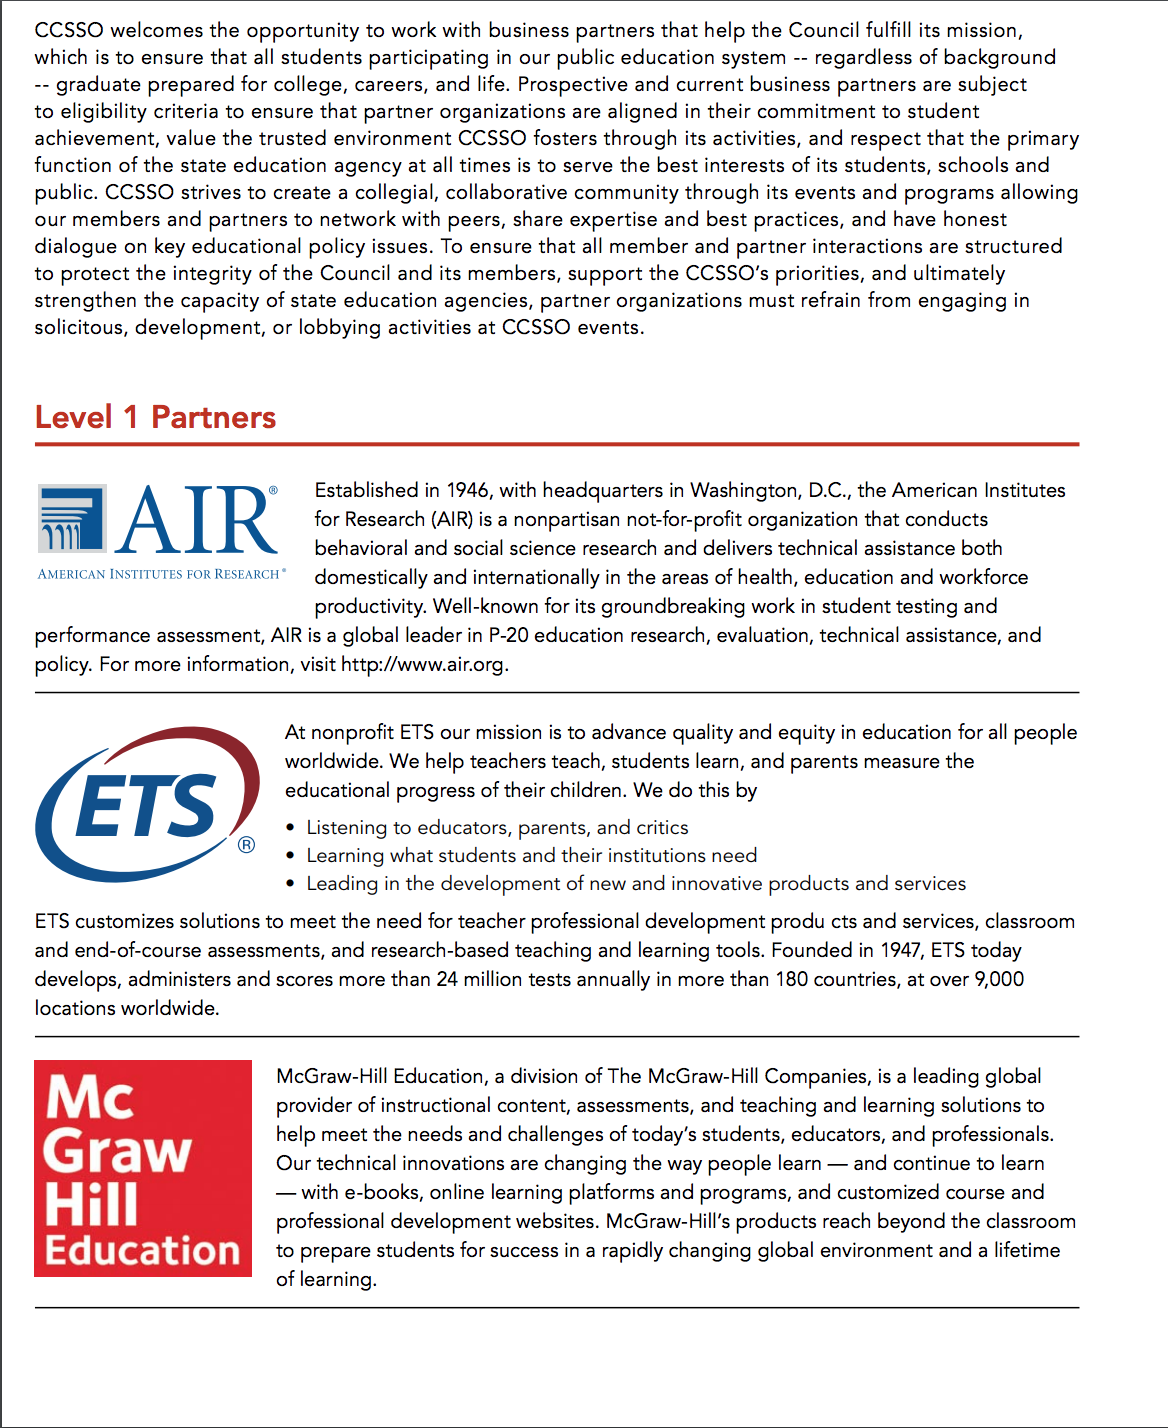 CCSSO Partners page 1